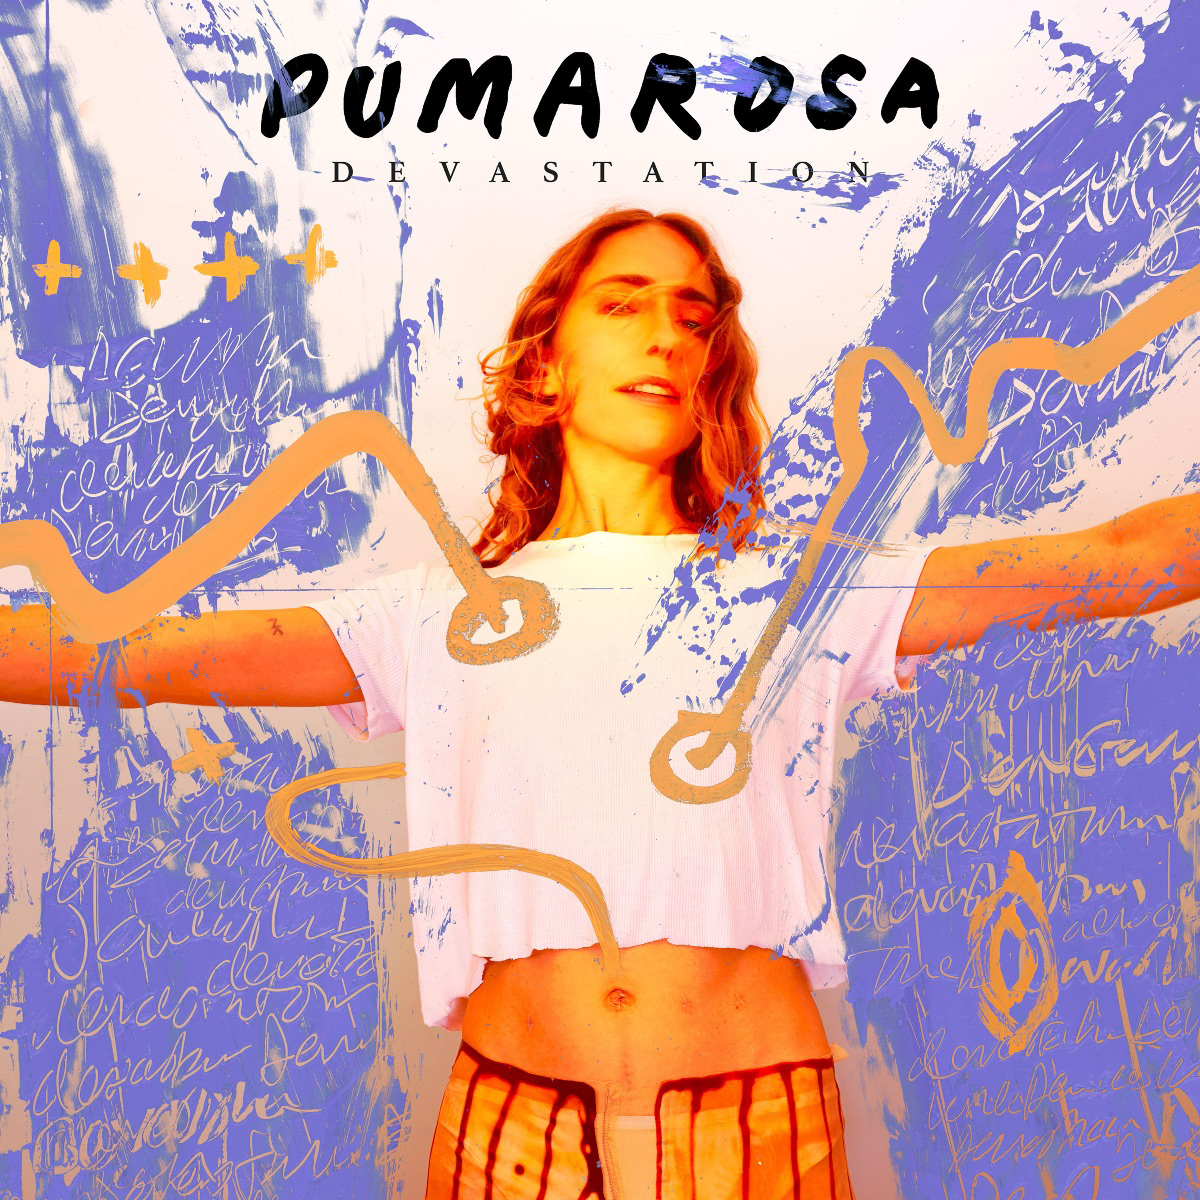 Pumarosa – Devastation (Fiction)